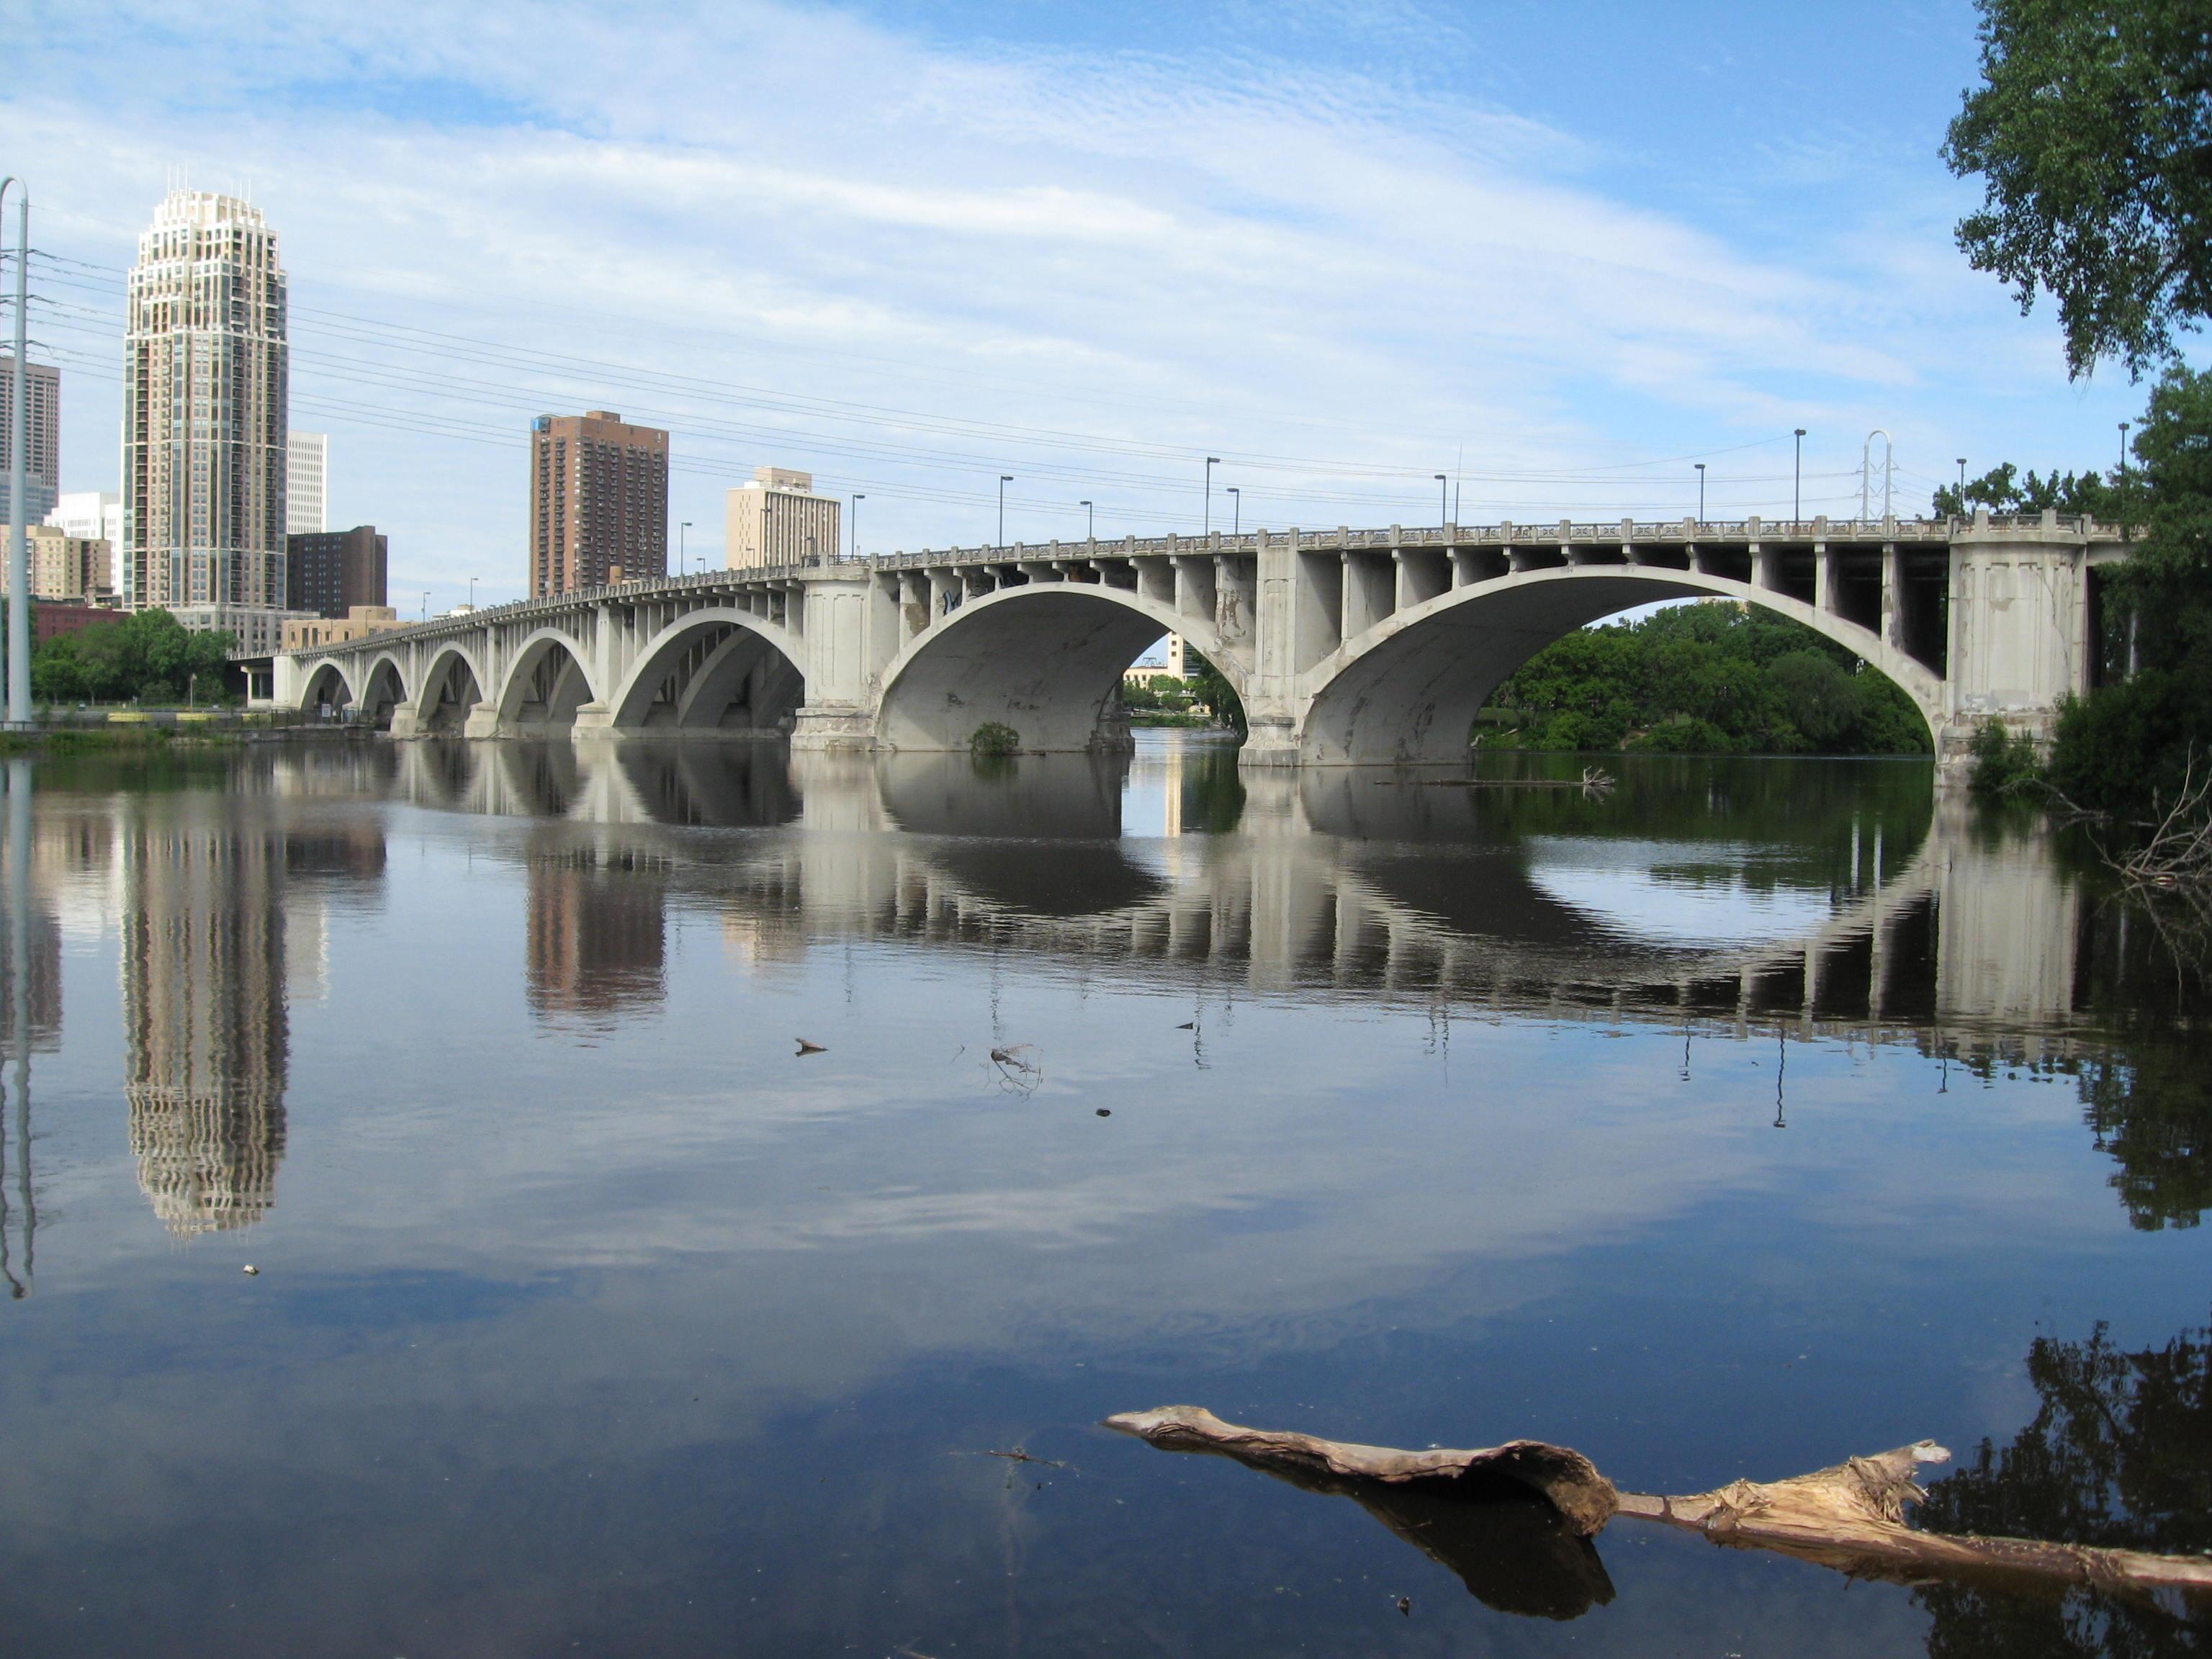 Bridge over the Mississippi, Minneapolis MN